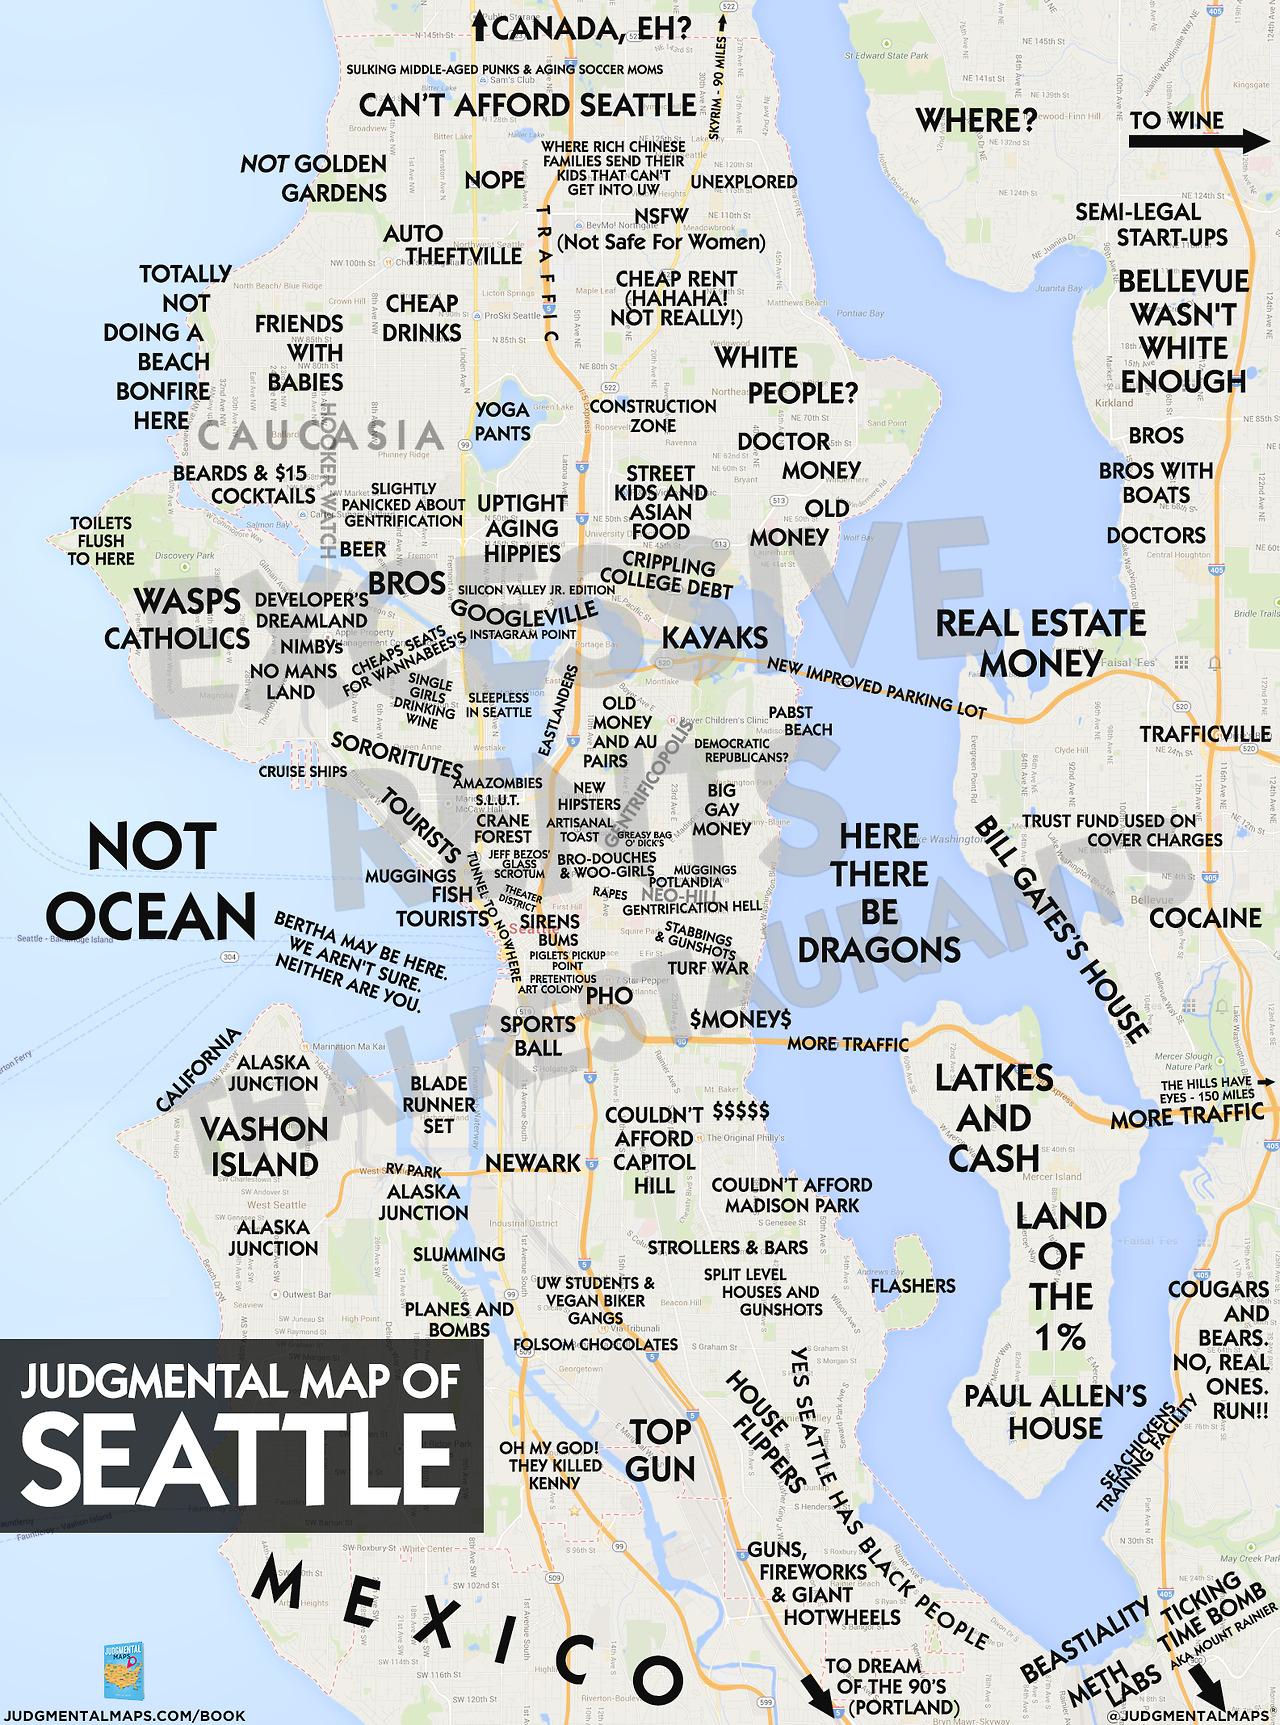 Angeles Judgemental Map Los